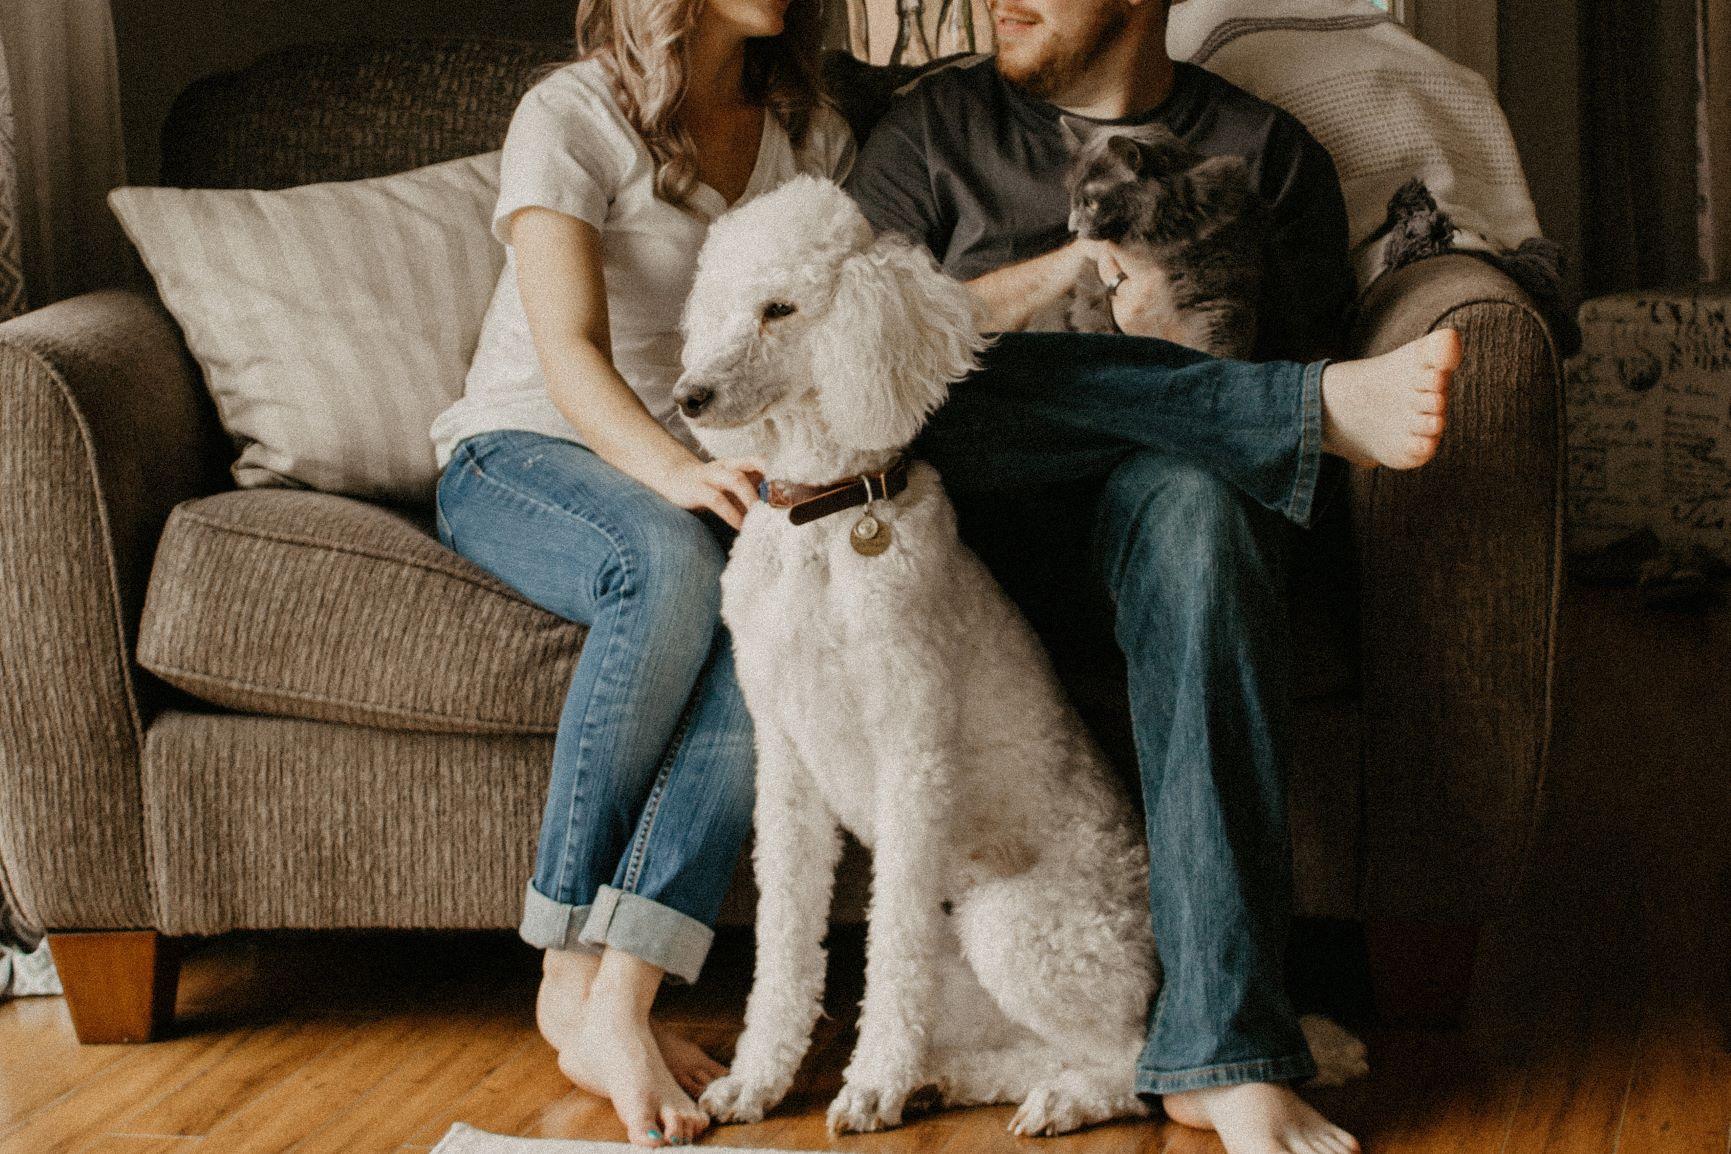 sarandy-westfall-666700-tenants-at-home-with-pets